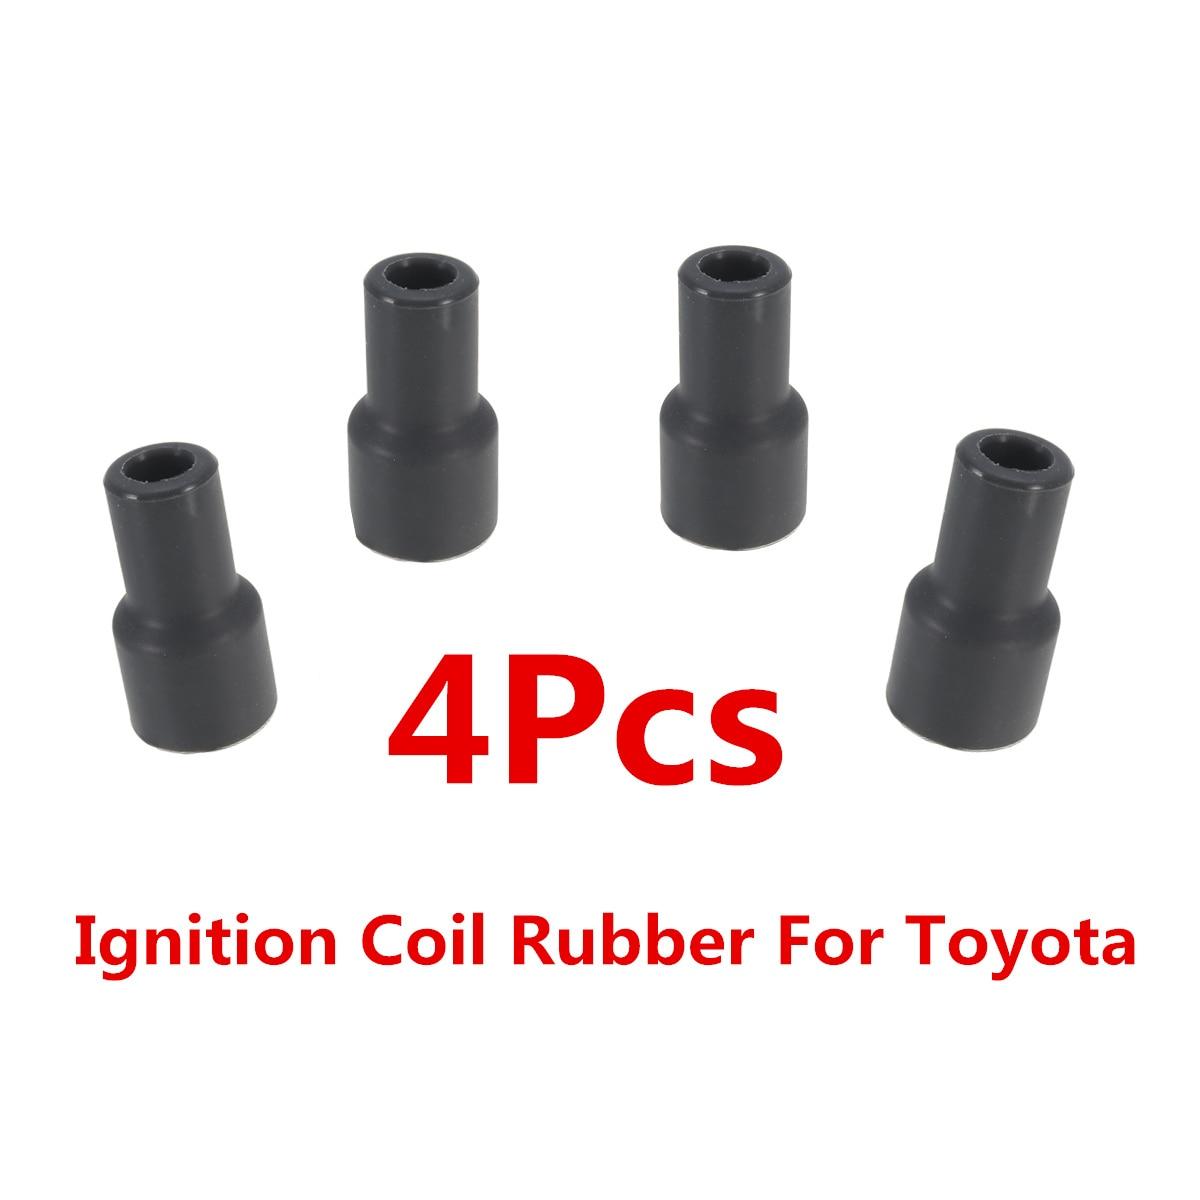 4pcs Spark ปลั๊กหมวกขั้วต่อขดลวดขดลวดปลั๊กยาง 90919-11009 90919 11009 สำหรับ Toyota YARIS VIOS CAMRY